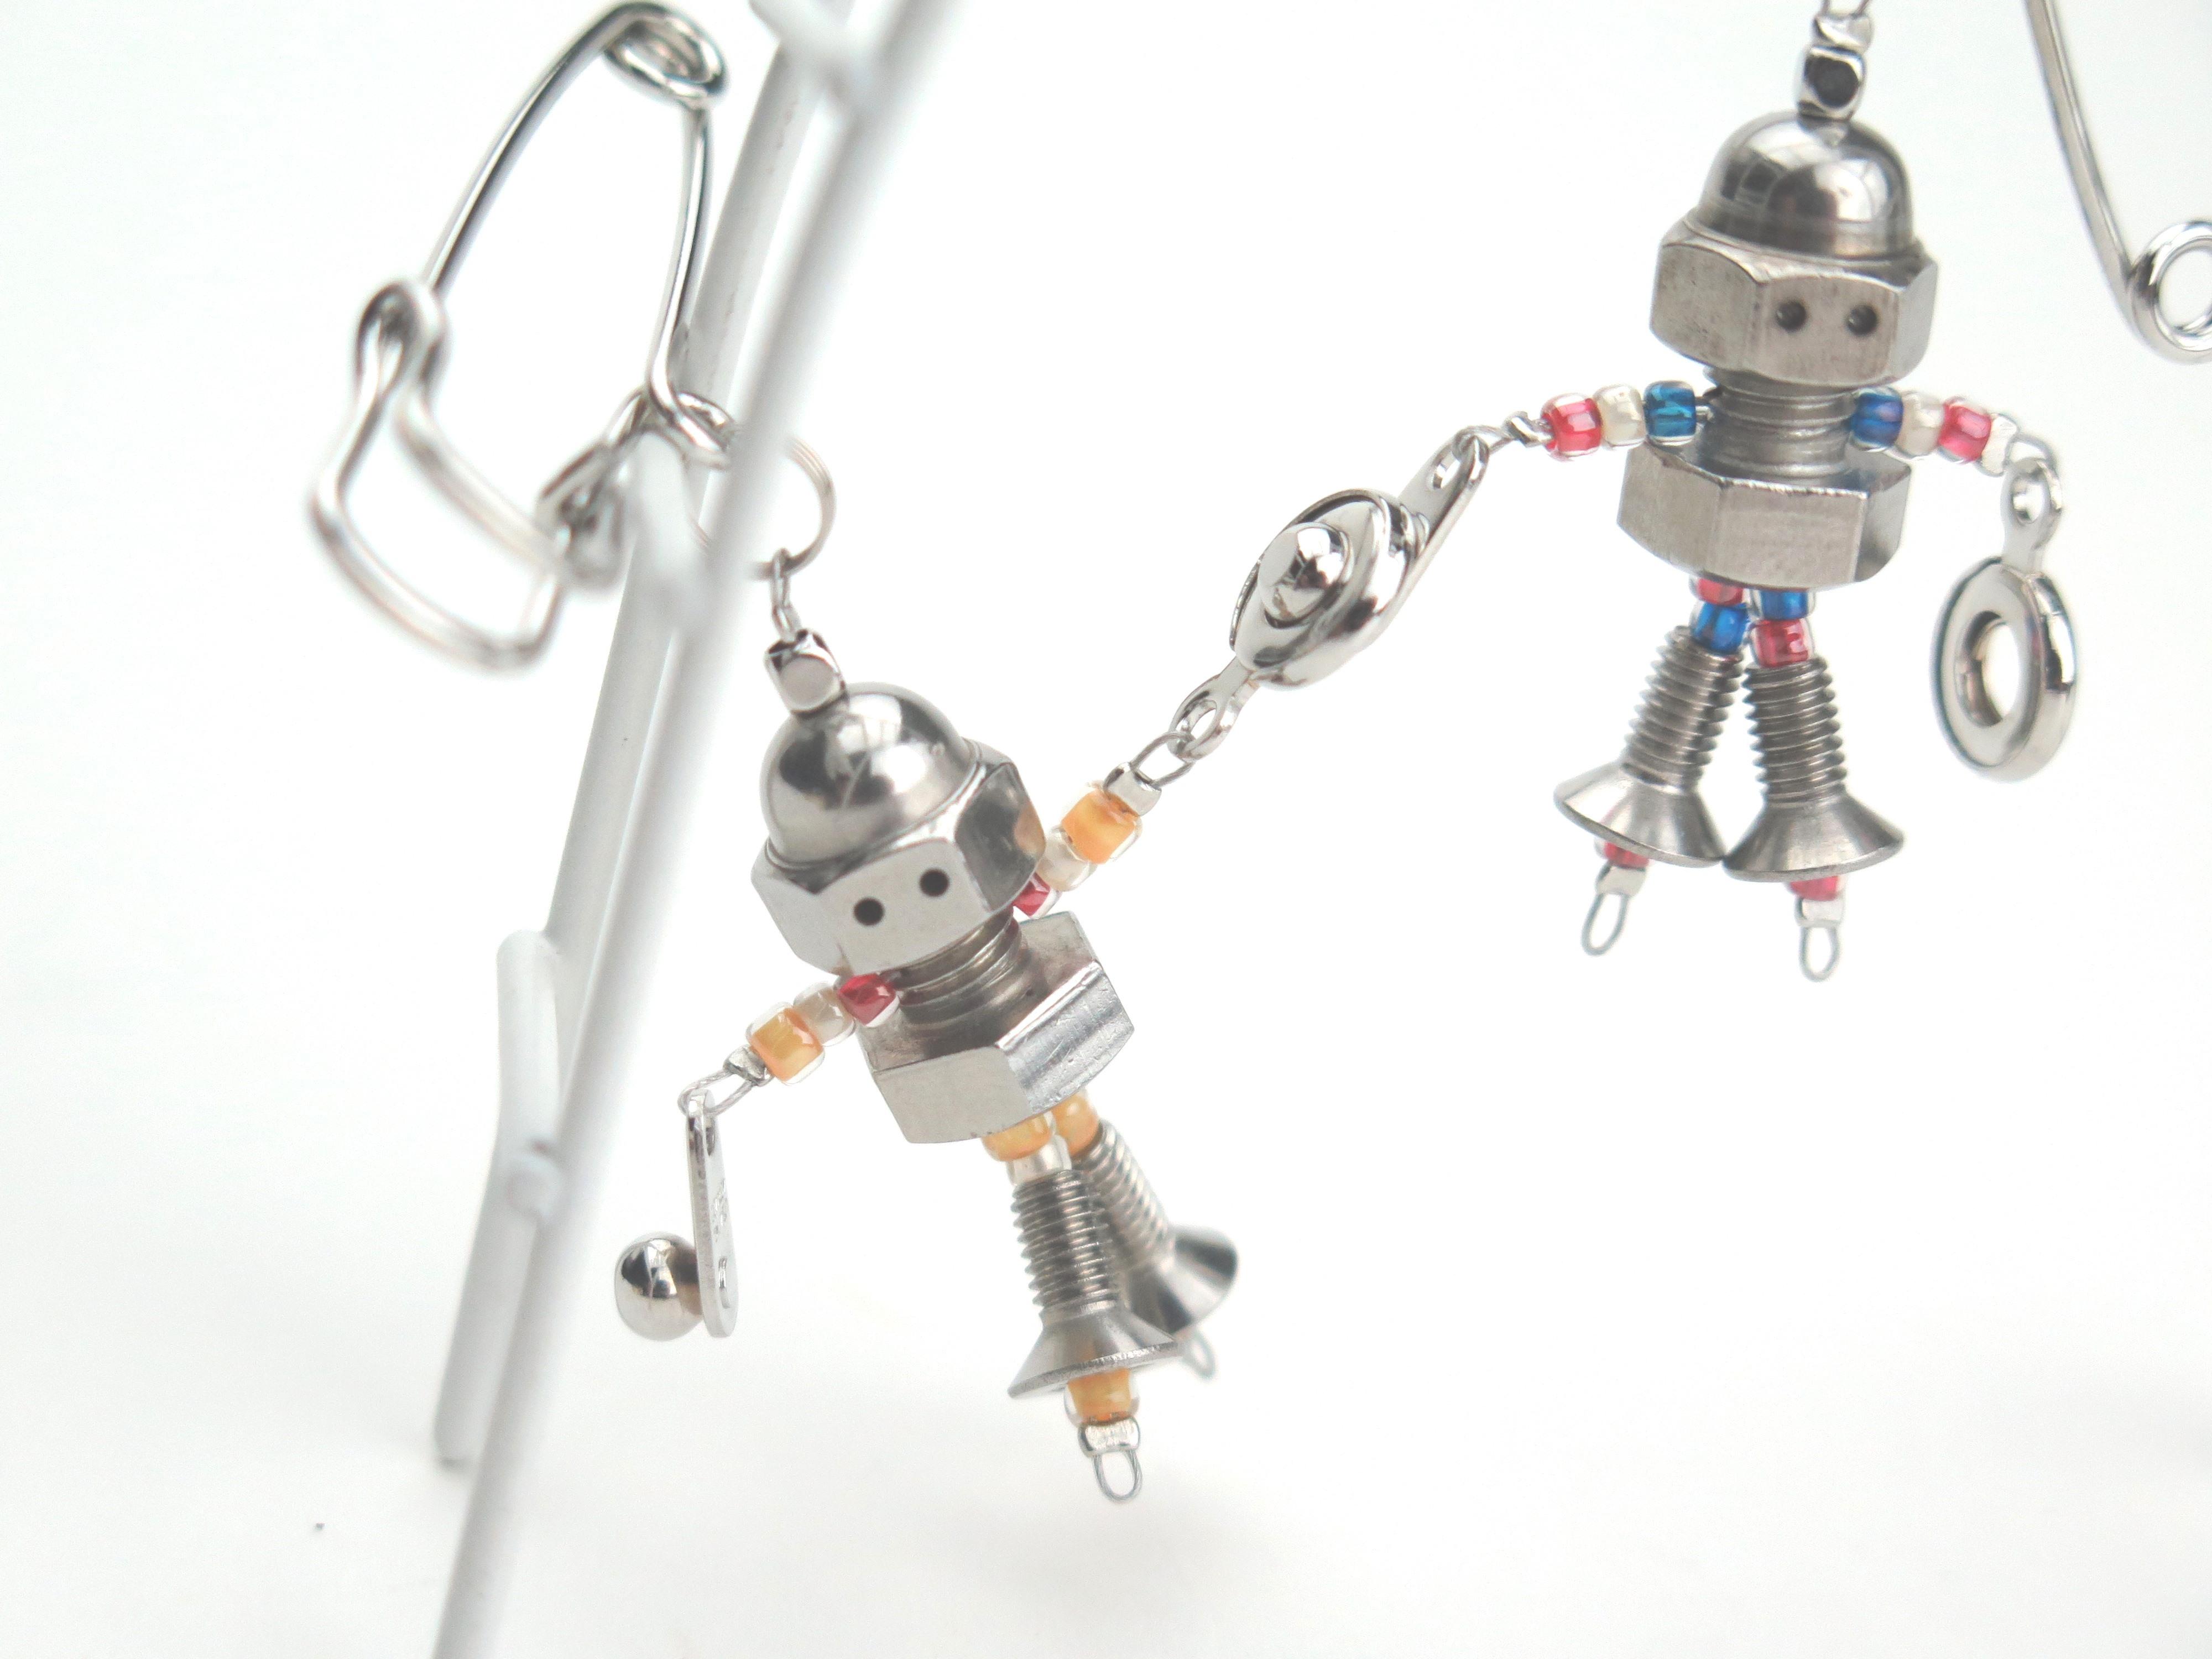 estro robot orange オレンジ